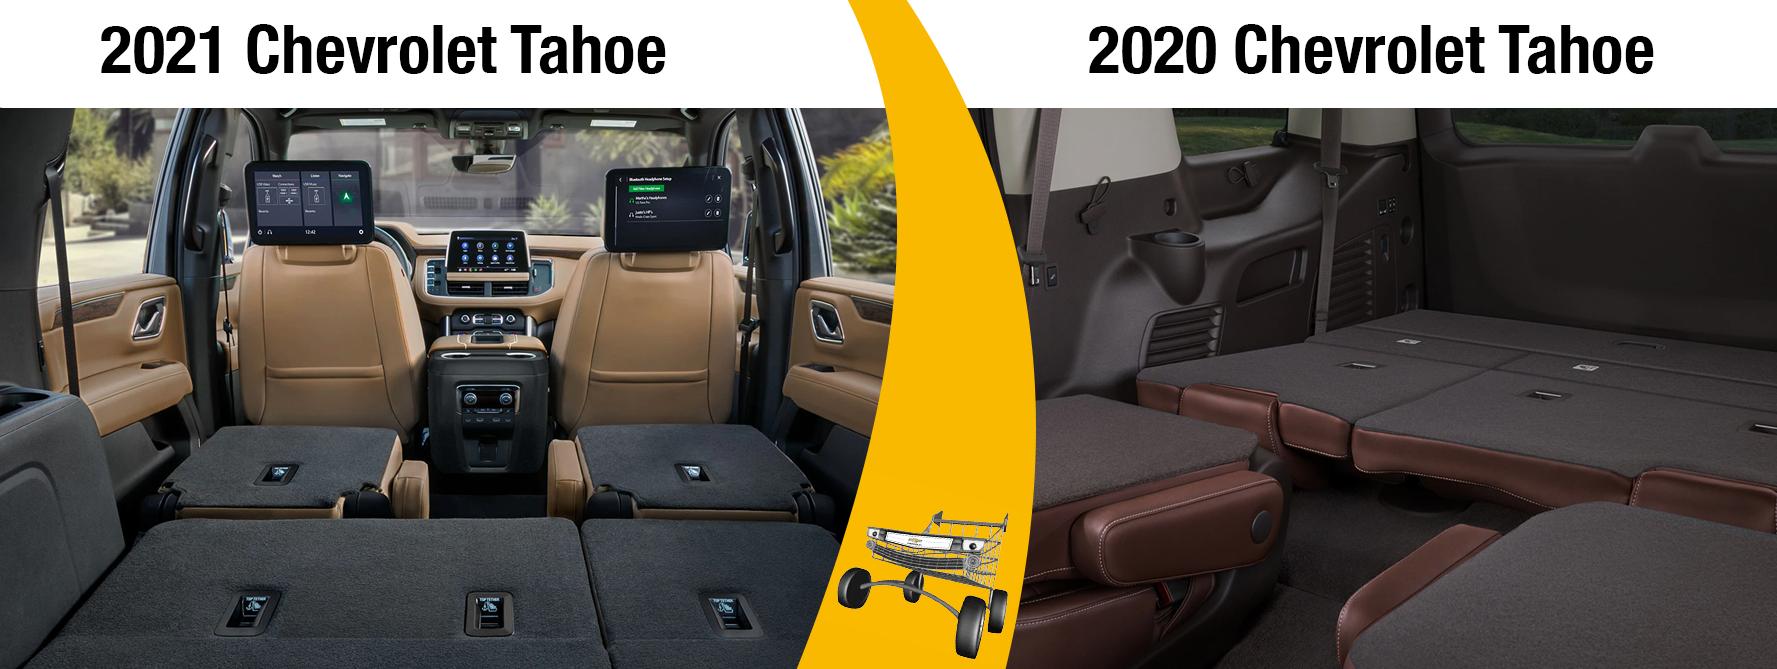 2021 Tahoe New Updates